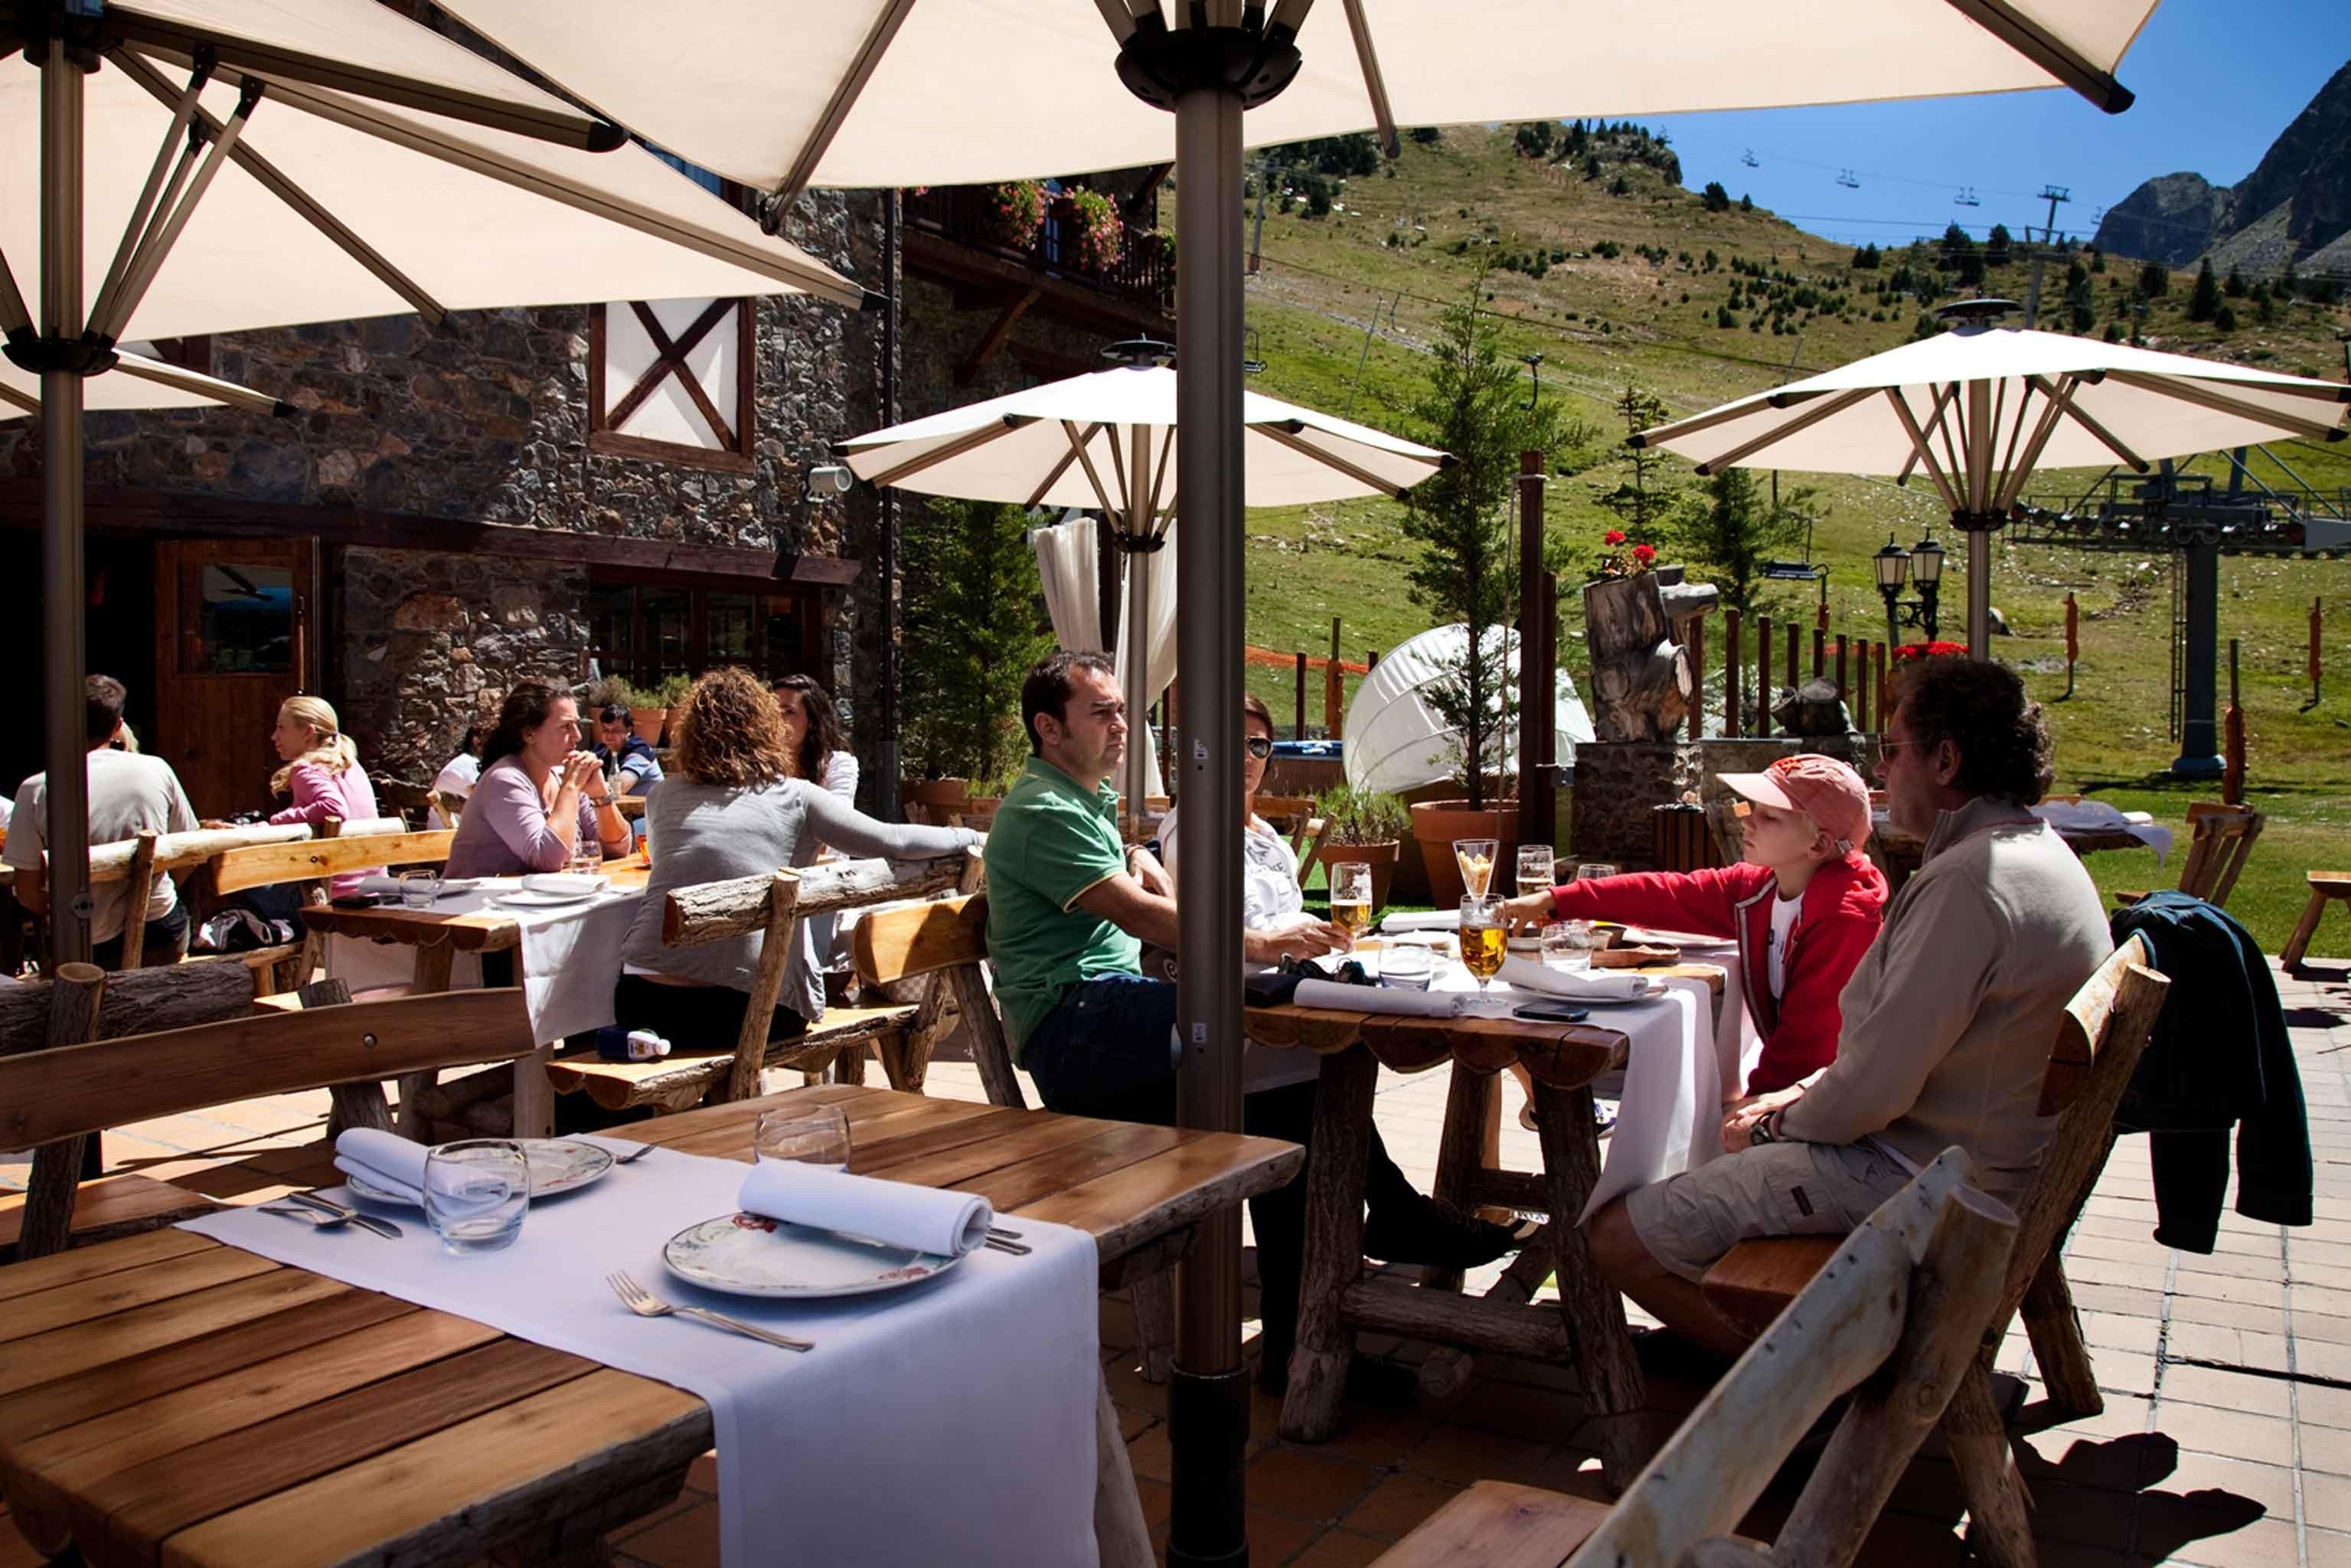 Adventure Dining Drink Eat Grounds Lodge Resort Rustic restaurant